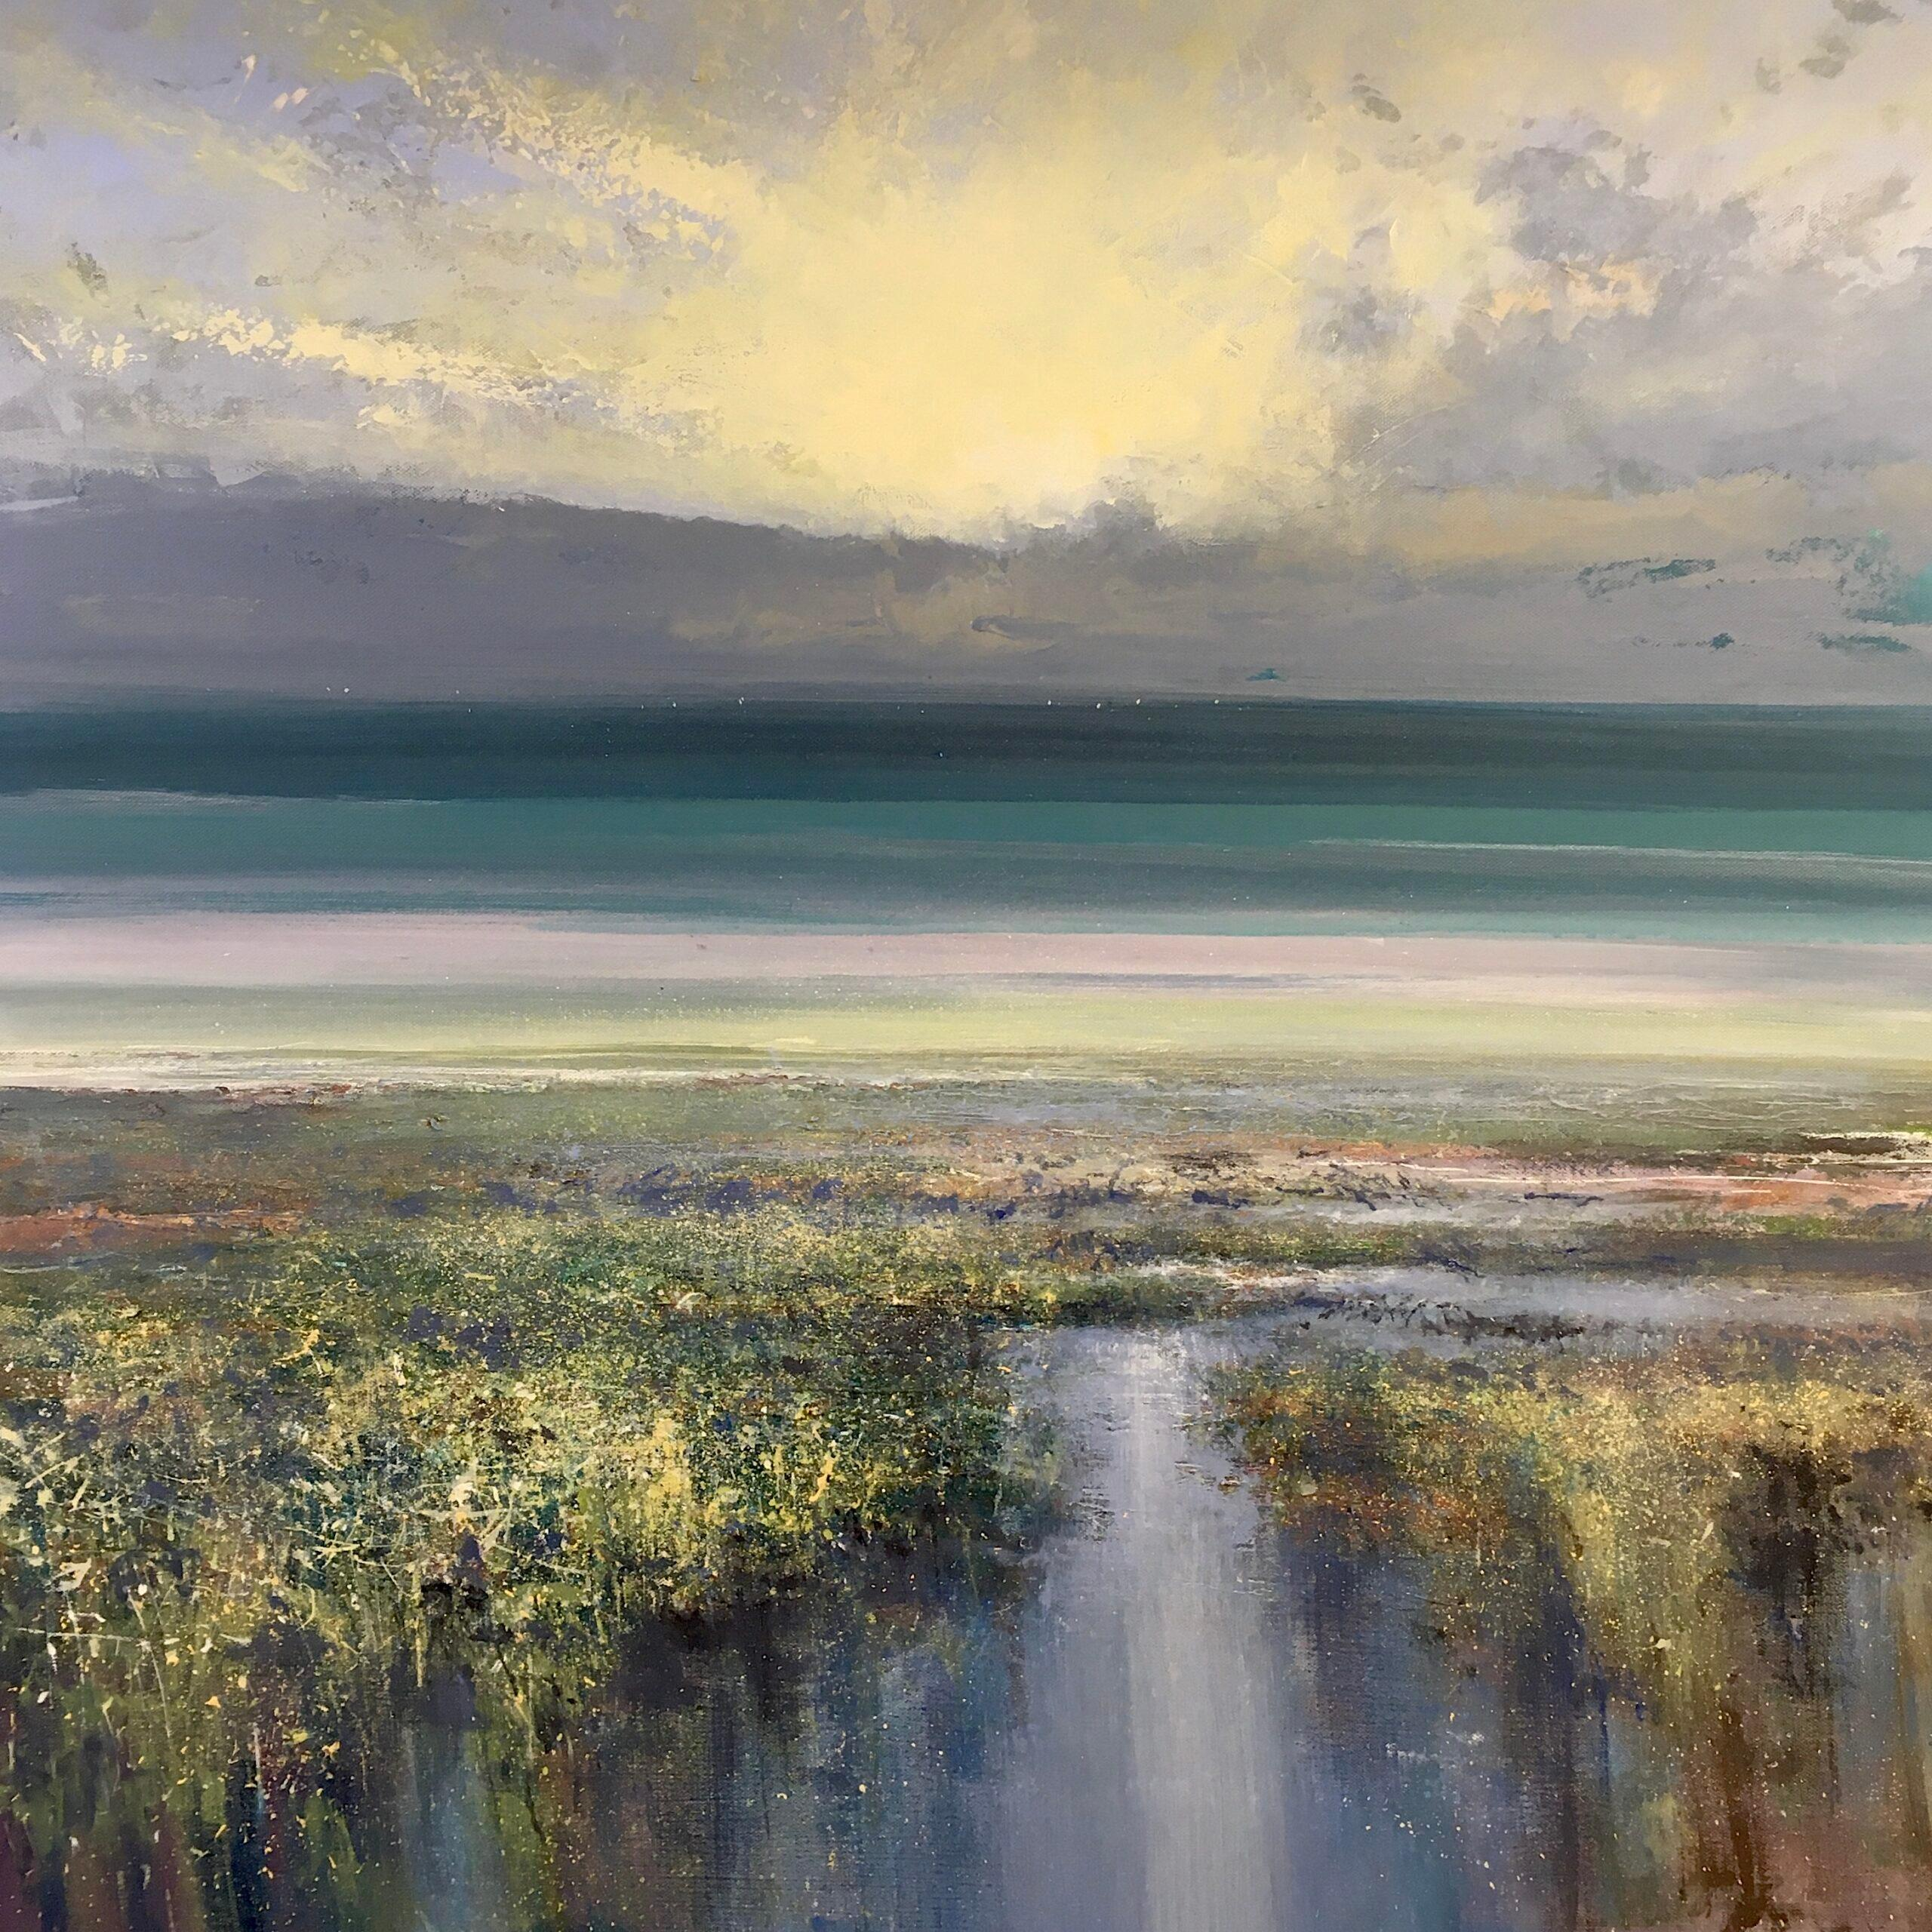 Estuary Evening - water seascape painting Contemporary 21st C modern art sky